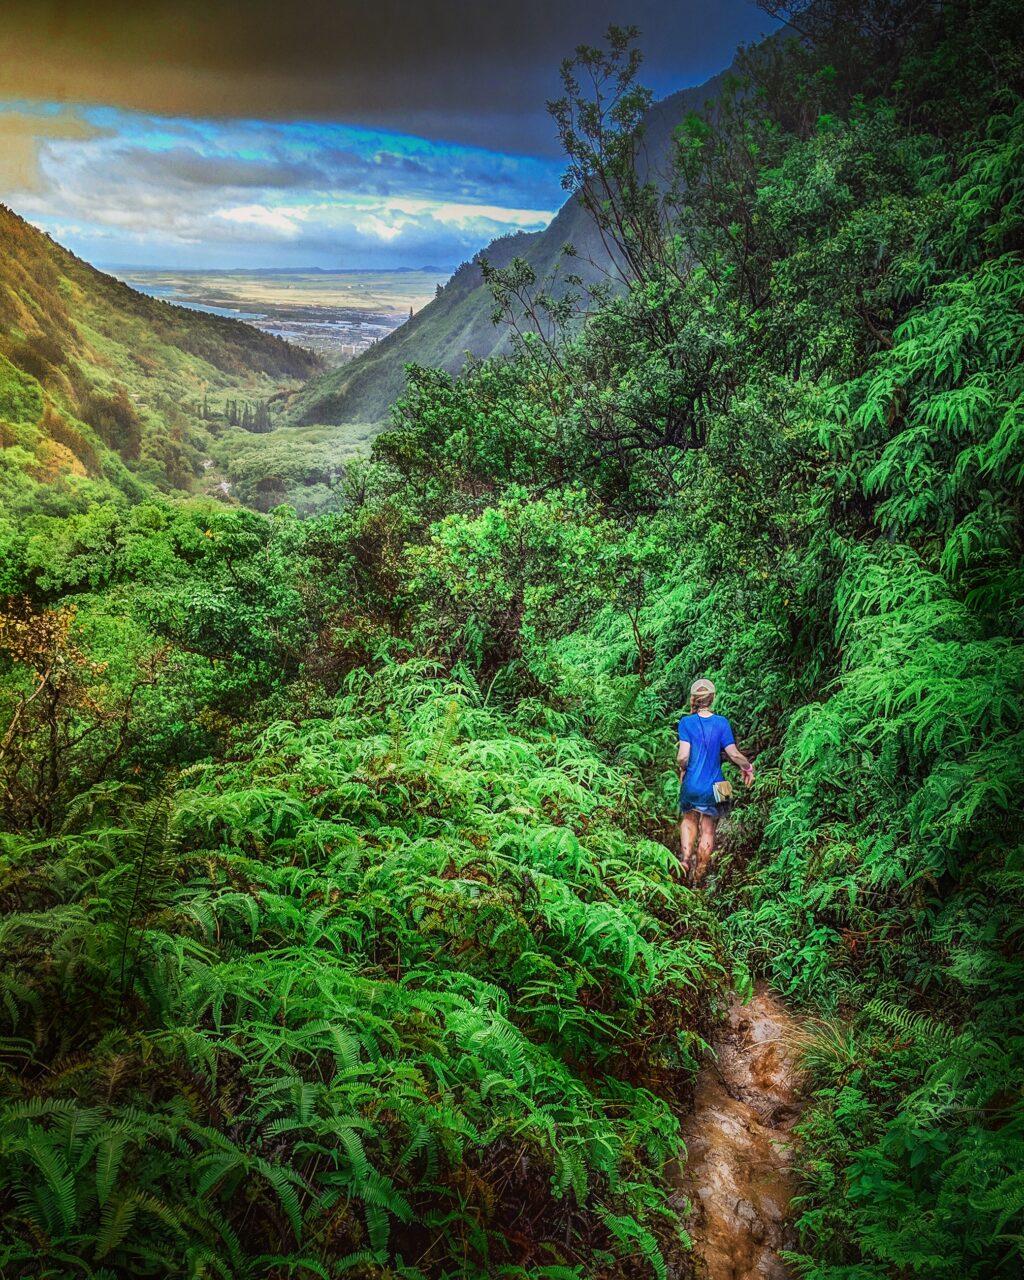 Woman hiking on dirt Tableland Secret Trail in mountainous Hawaiian jungle, Iao Valley, Maui.